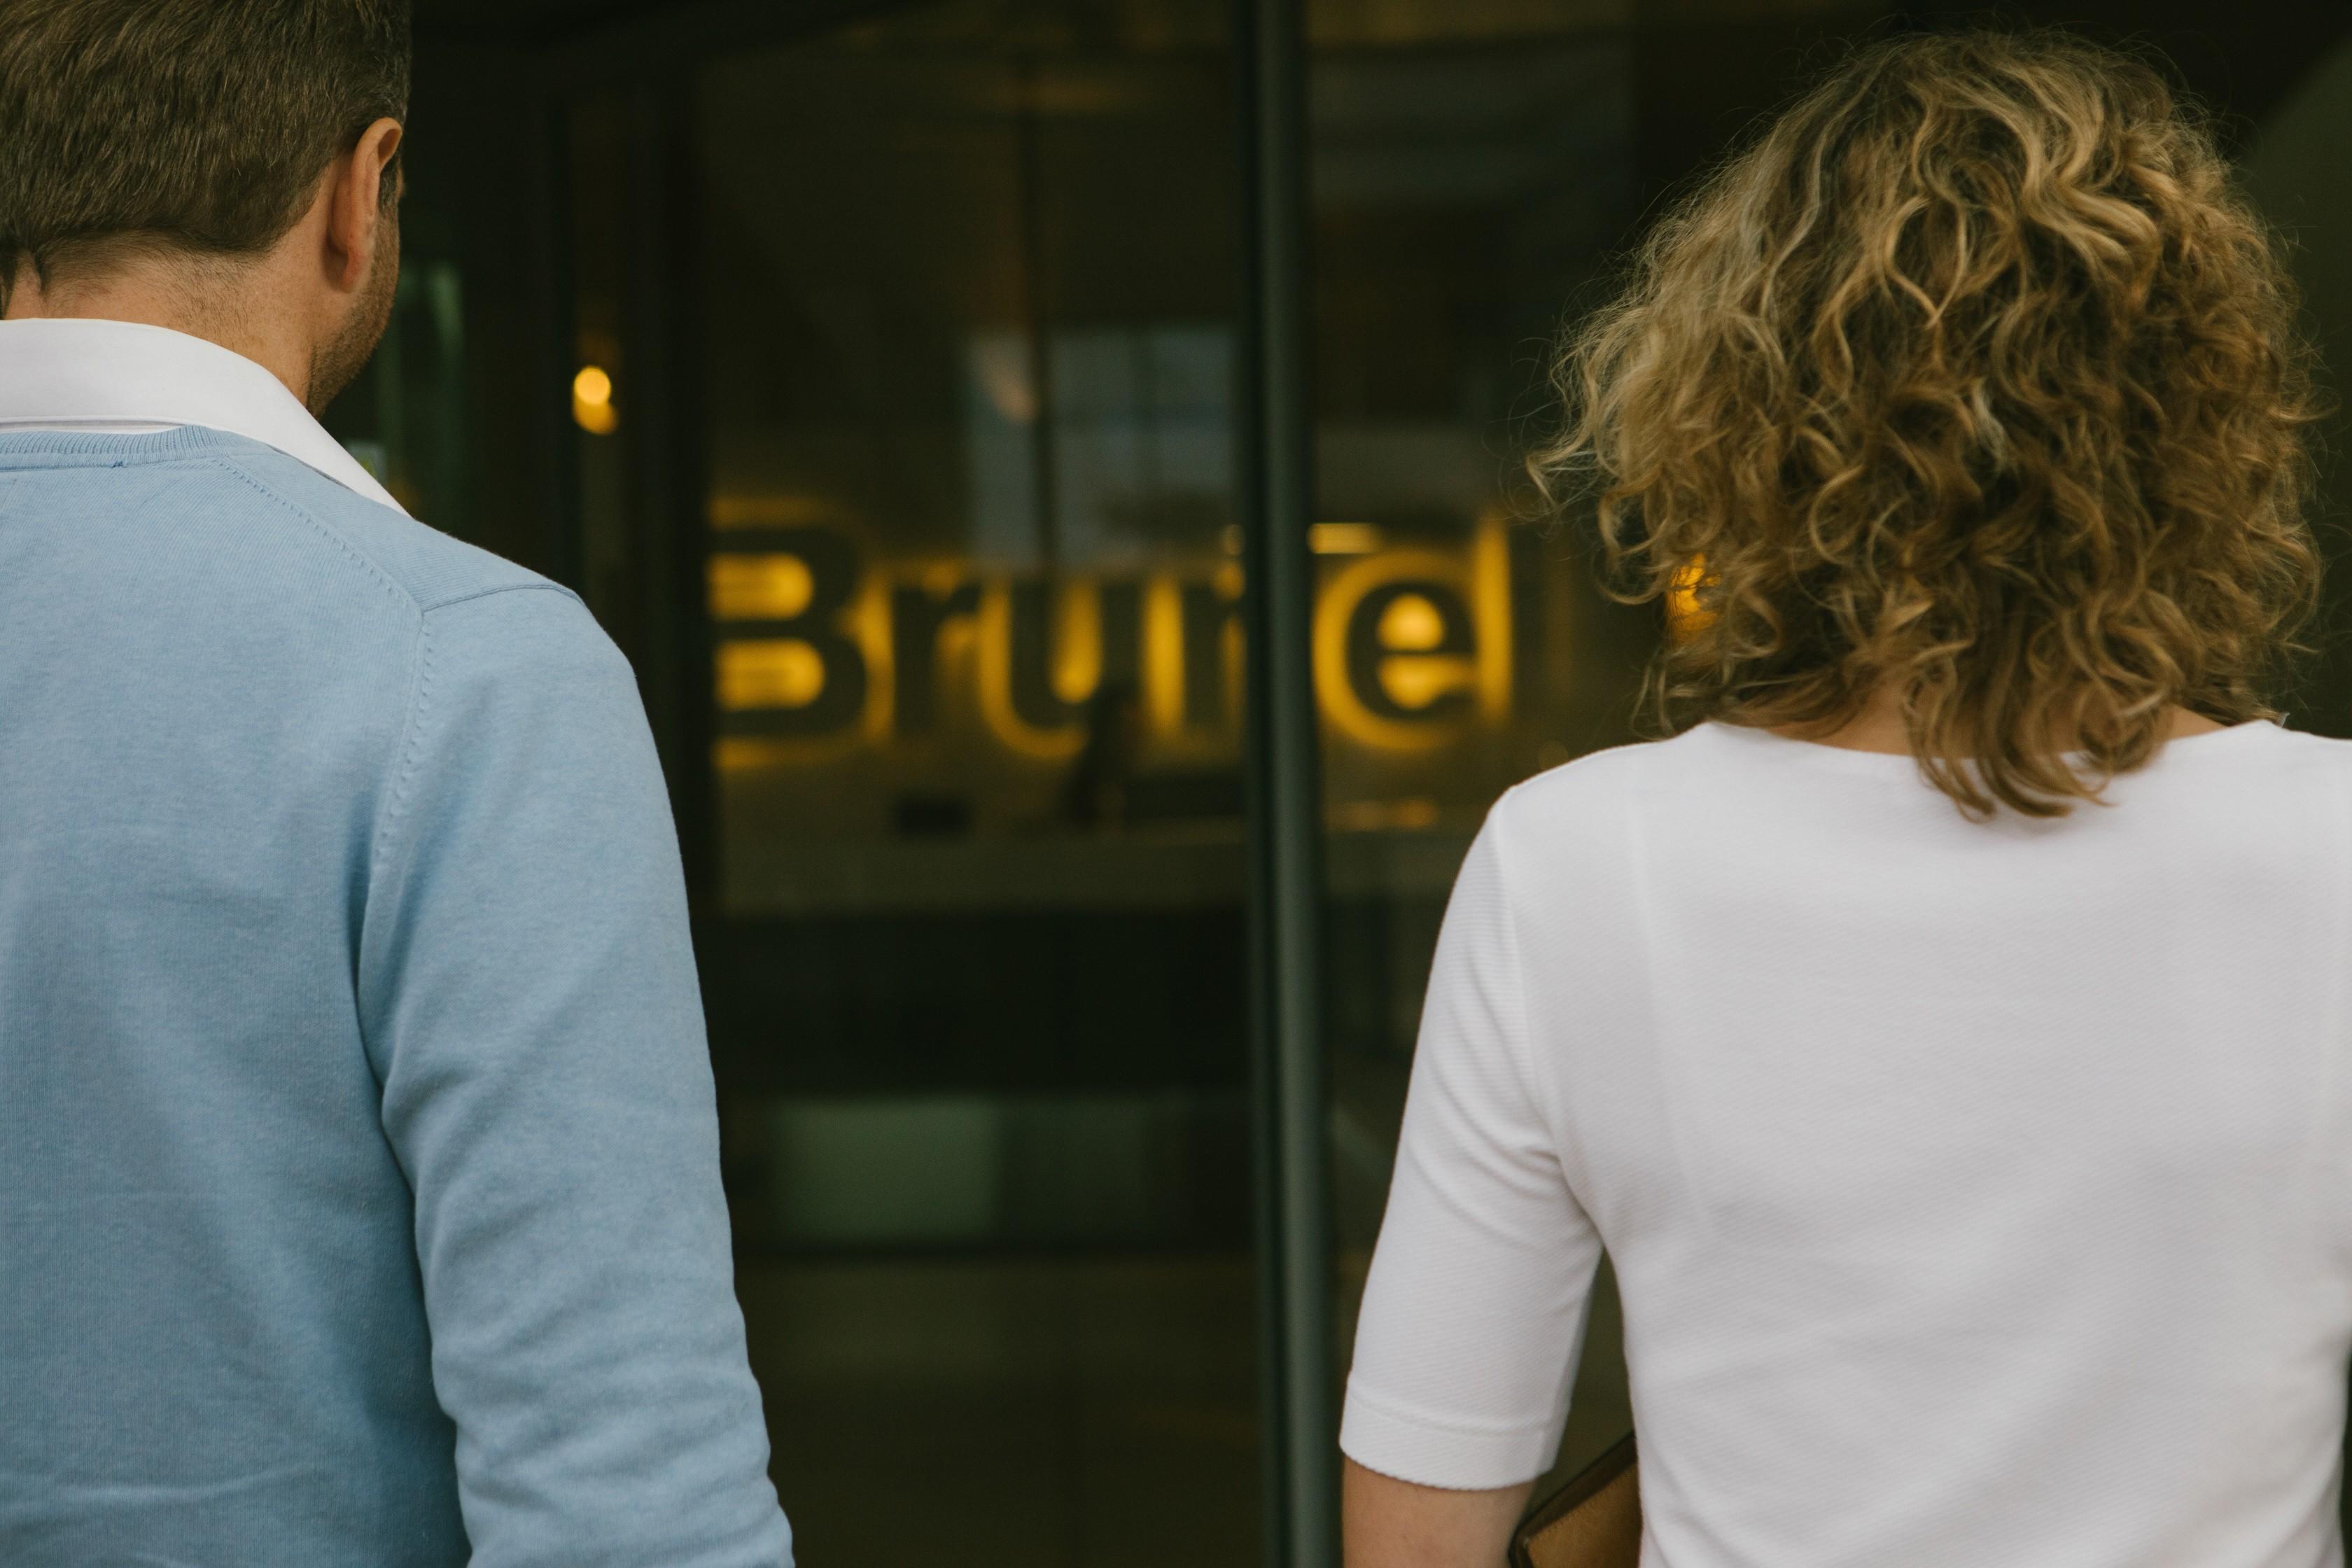 Brunel | LinkedIn